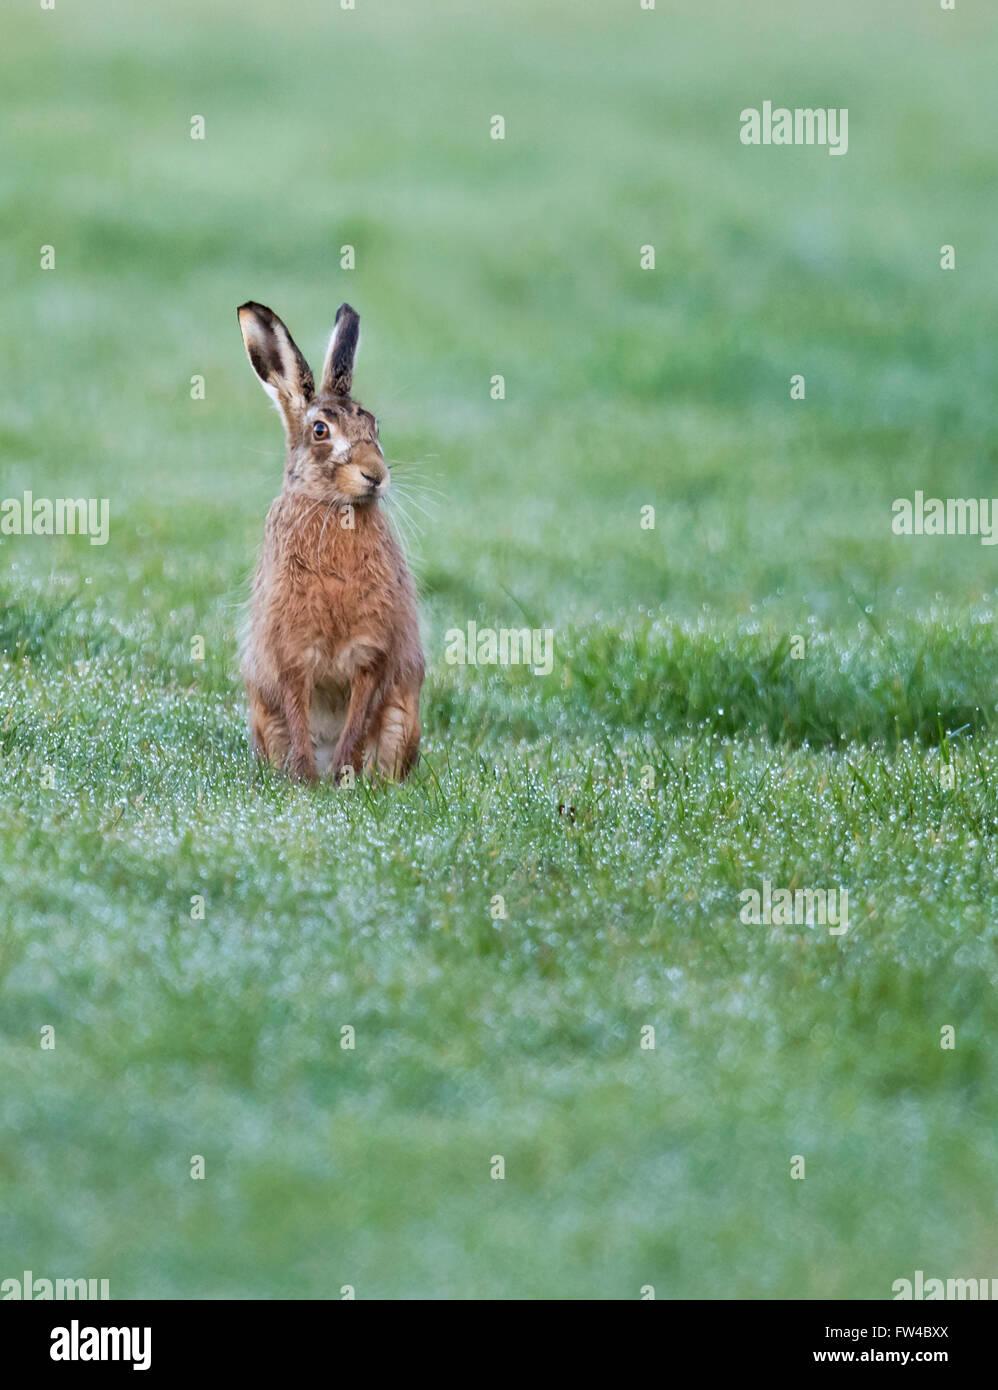 Brown Liebre Lepus europaeus sentarse erguido y alerta , Warwickshire Imagen De Stock